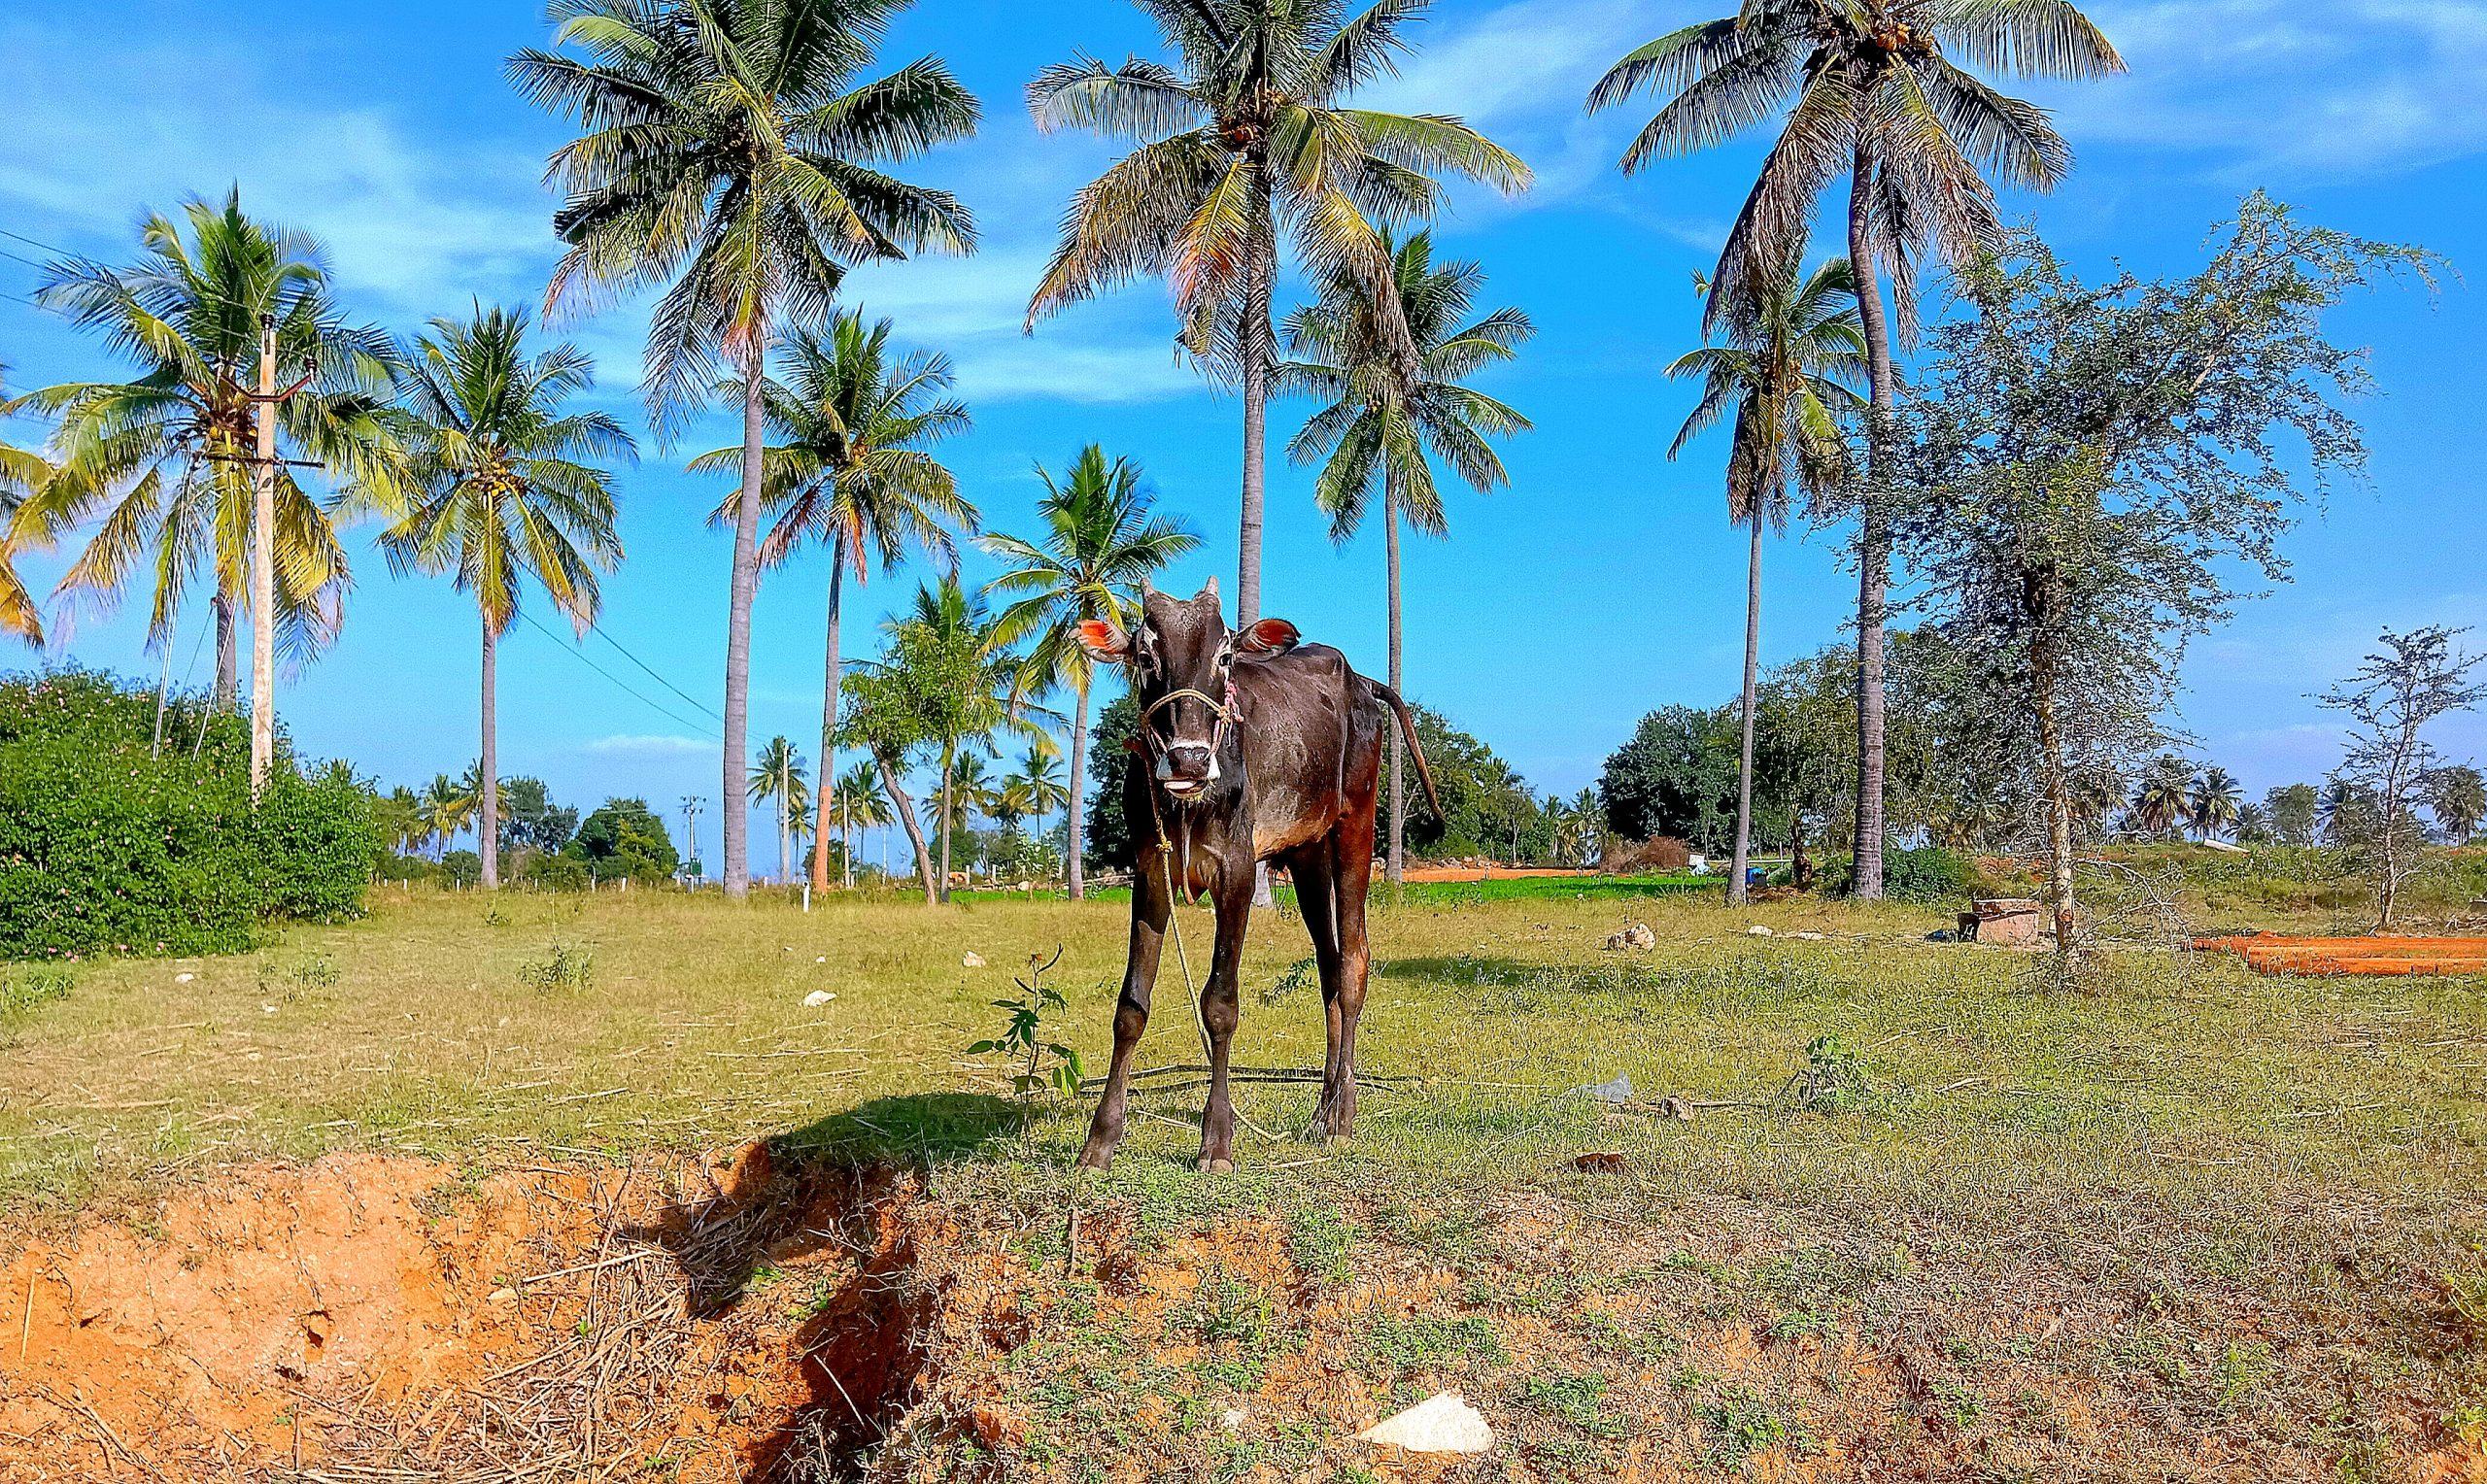 Ox in the farm